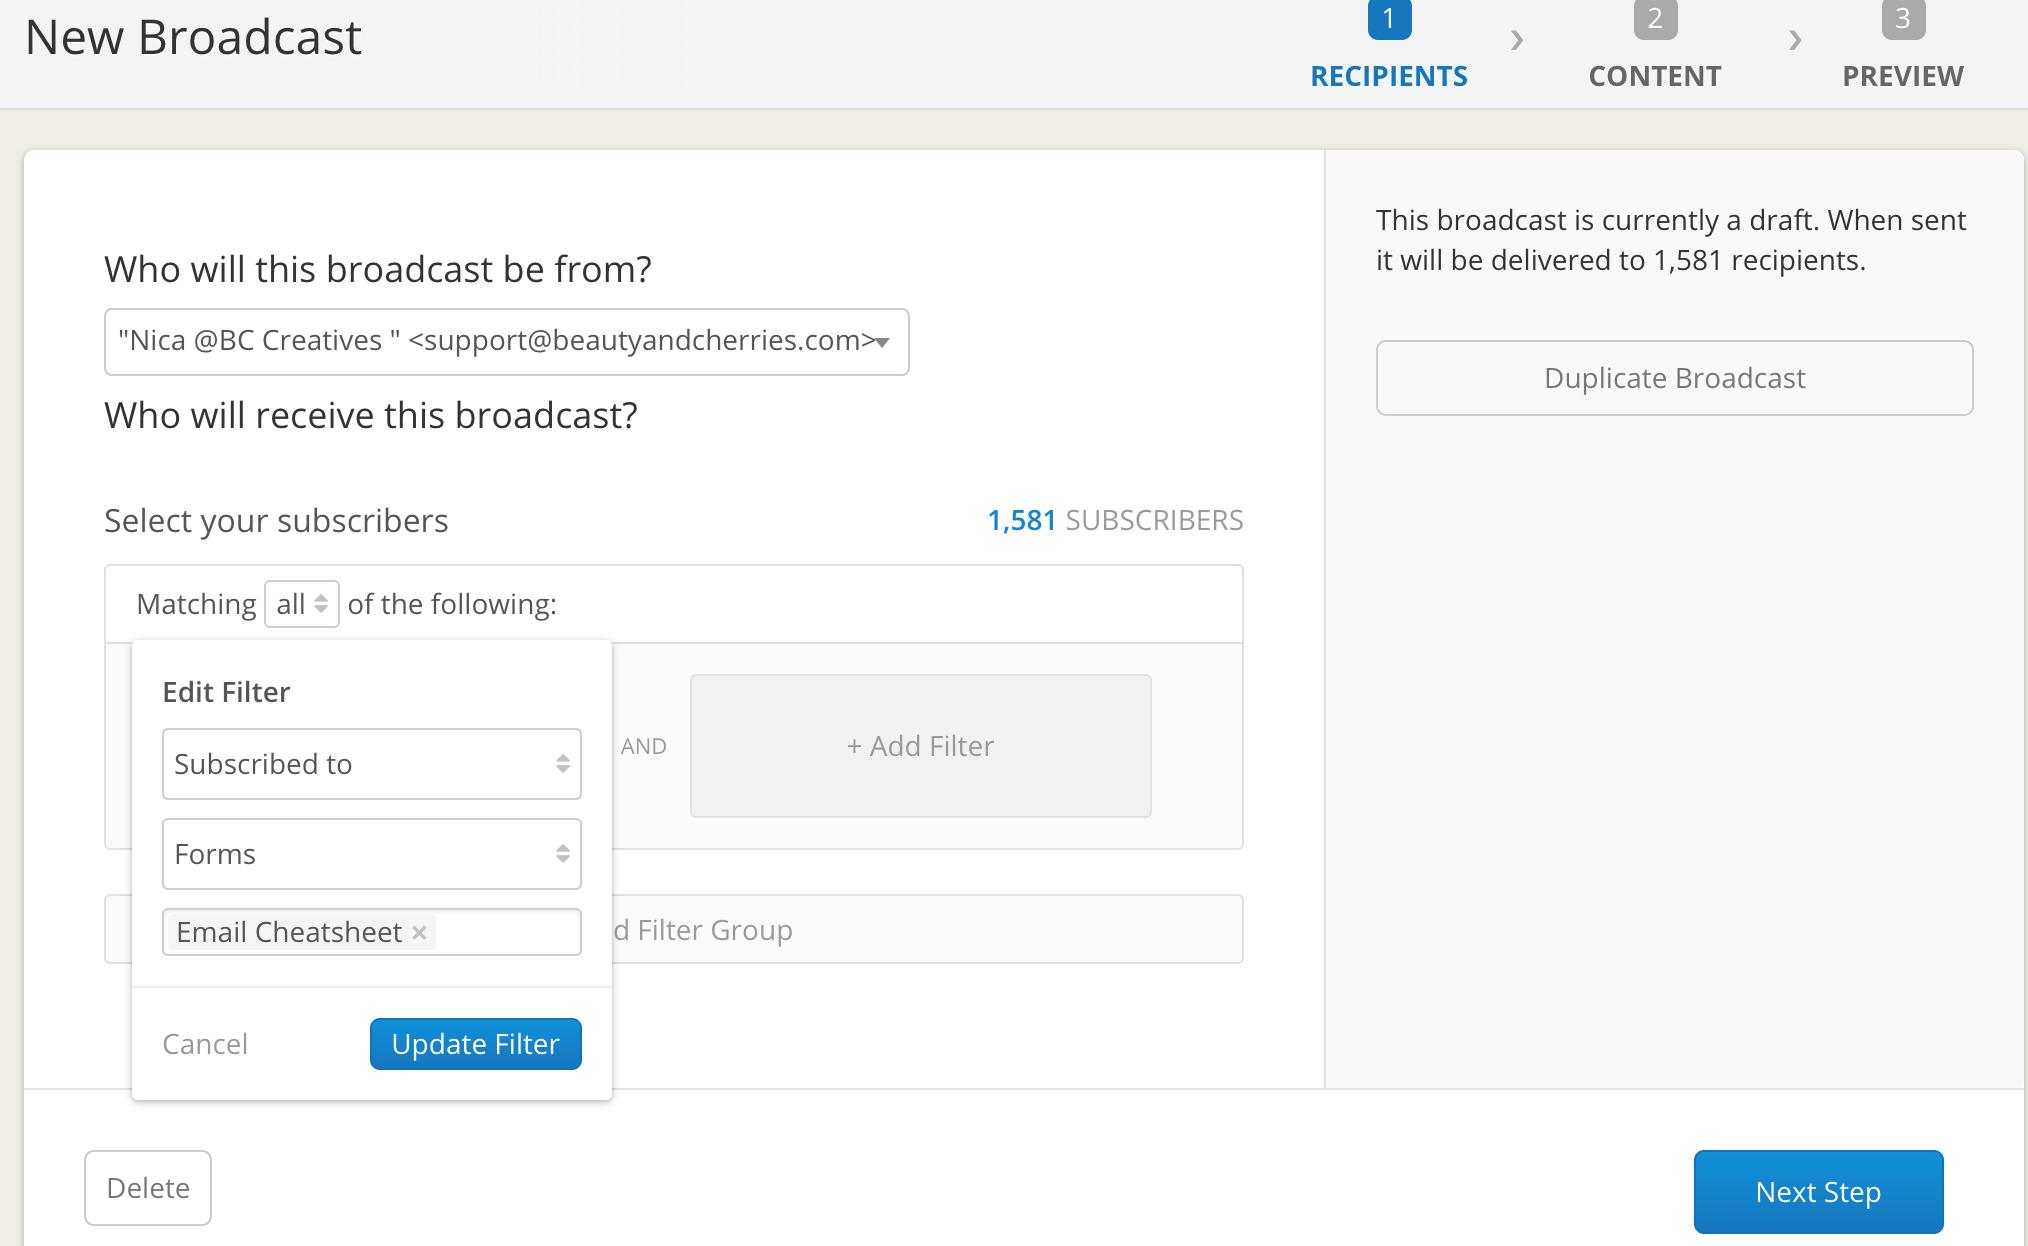 create-new-broadcast-convertkit